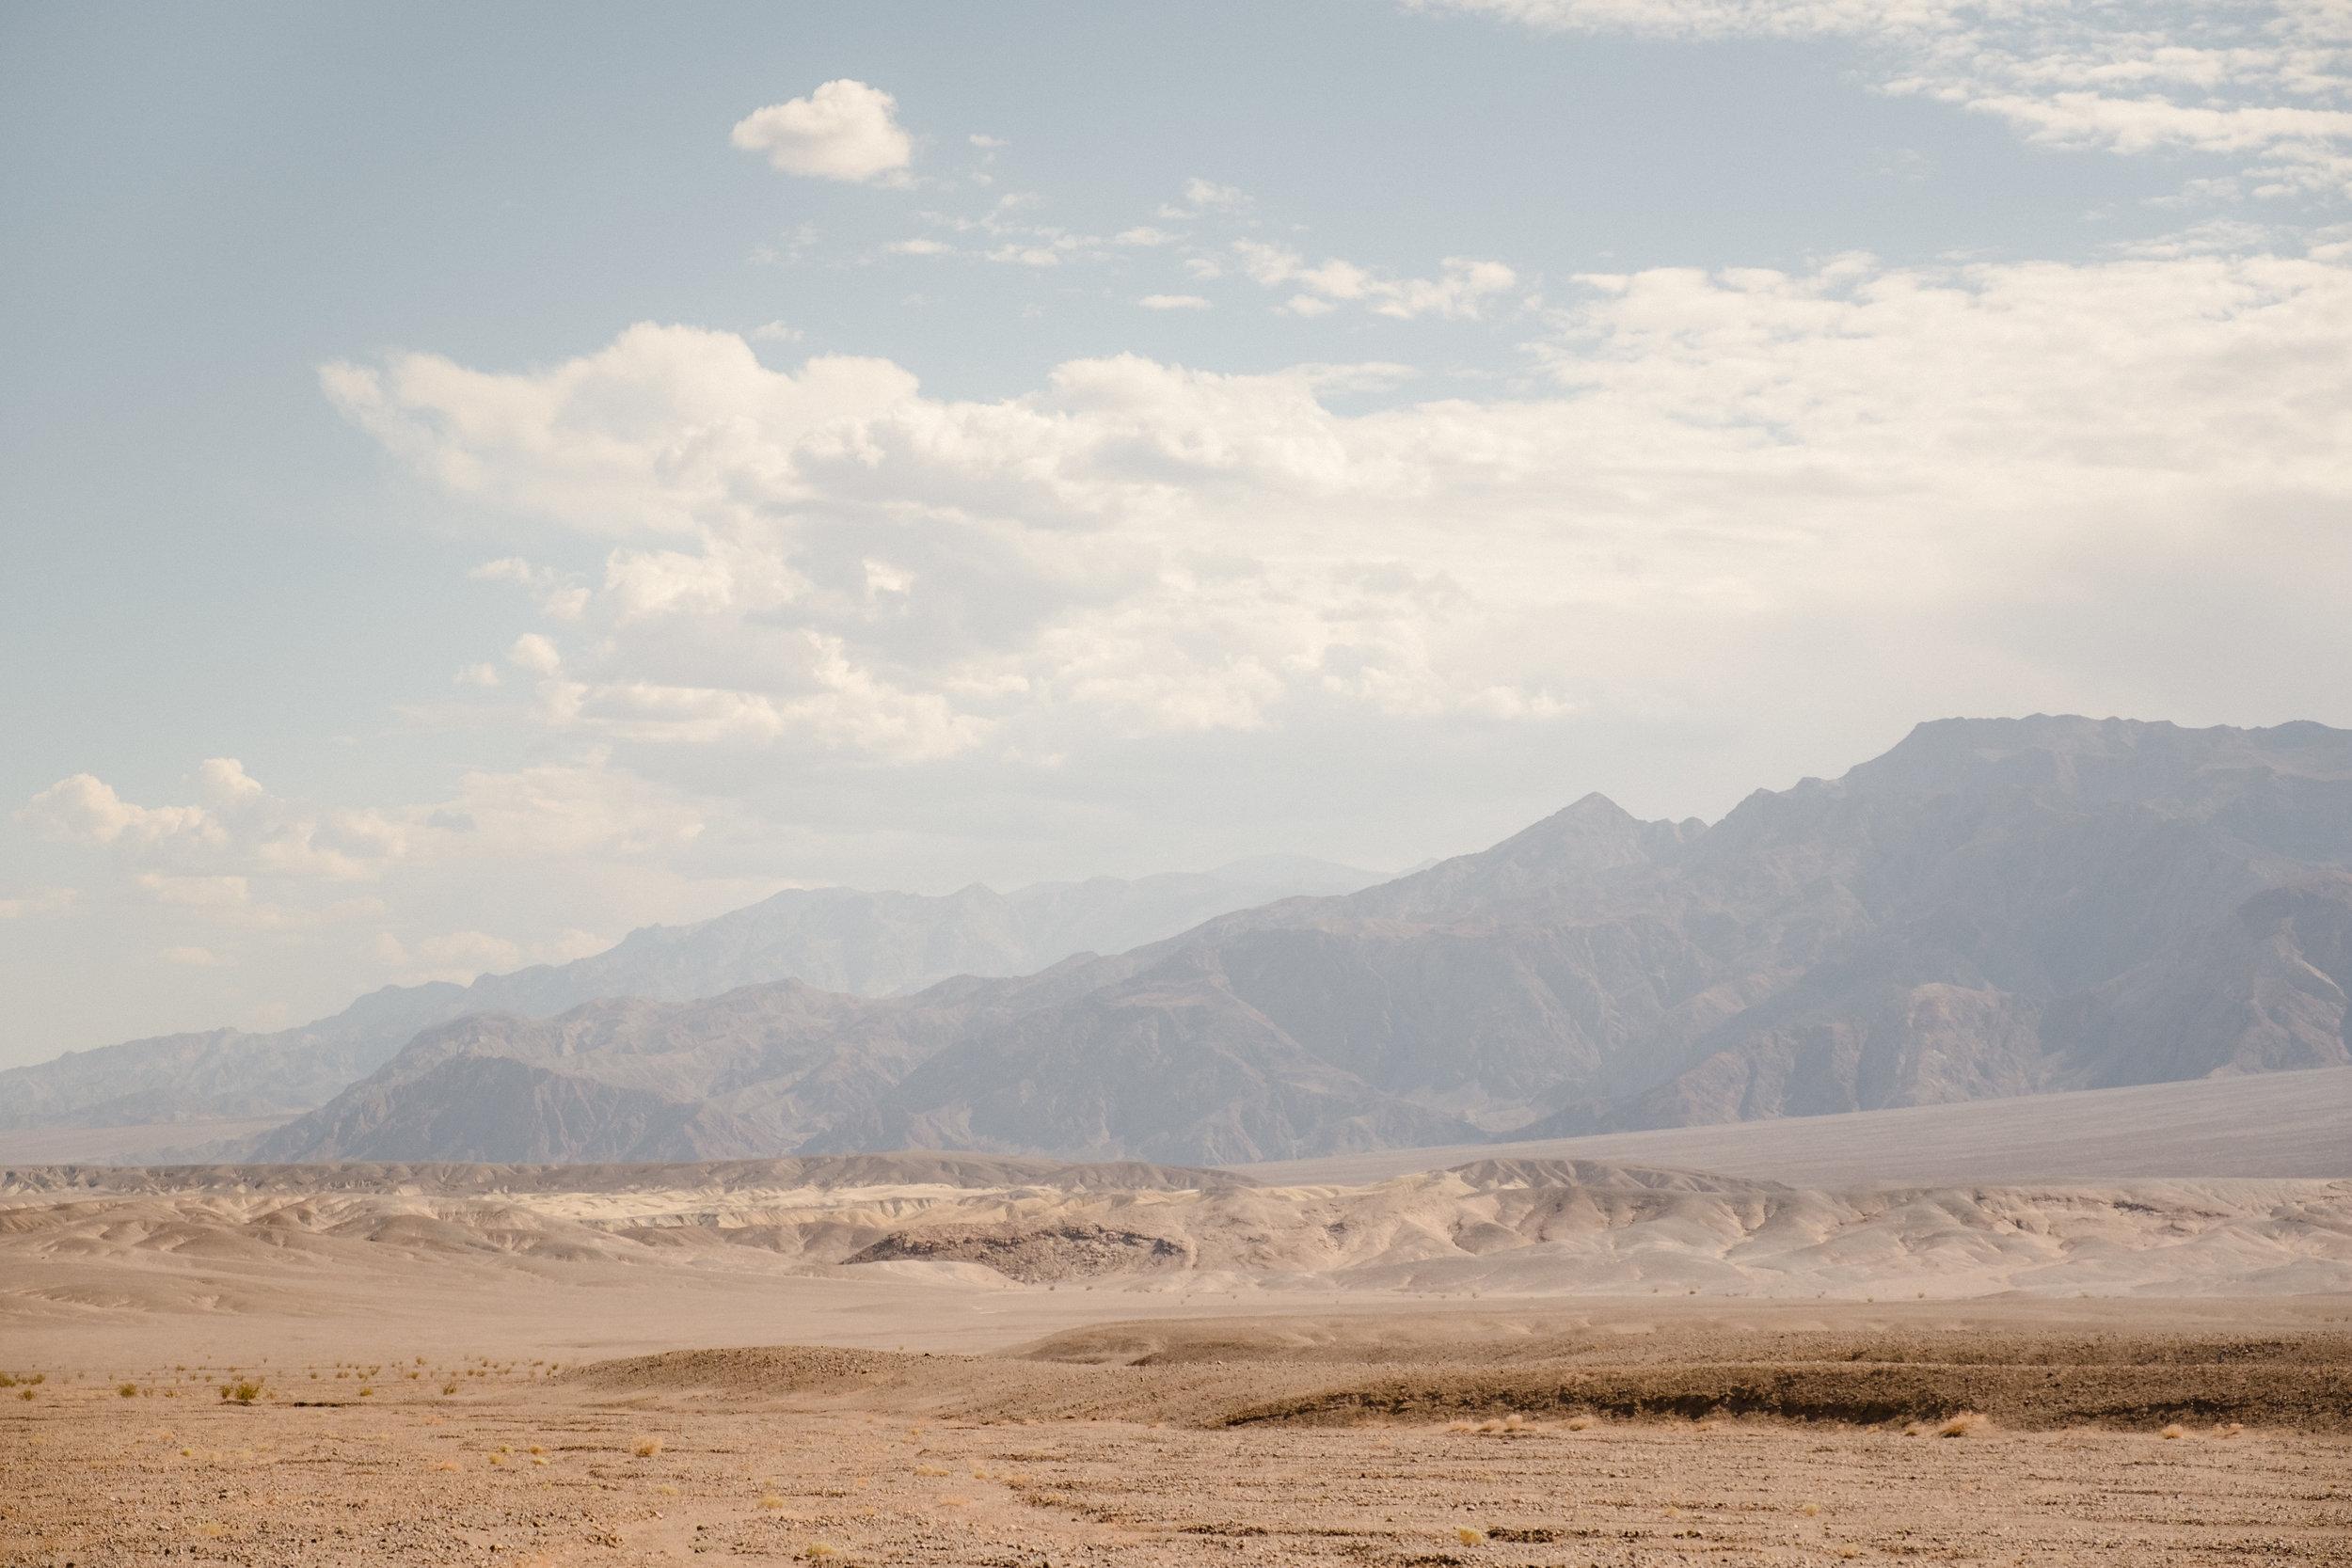 Death_Valley_National_Park3.jpg